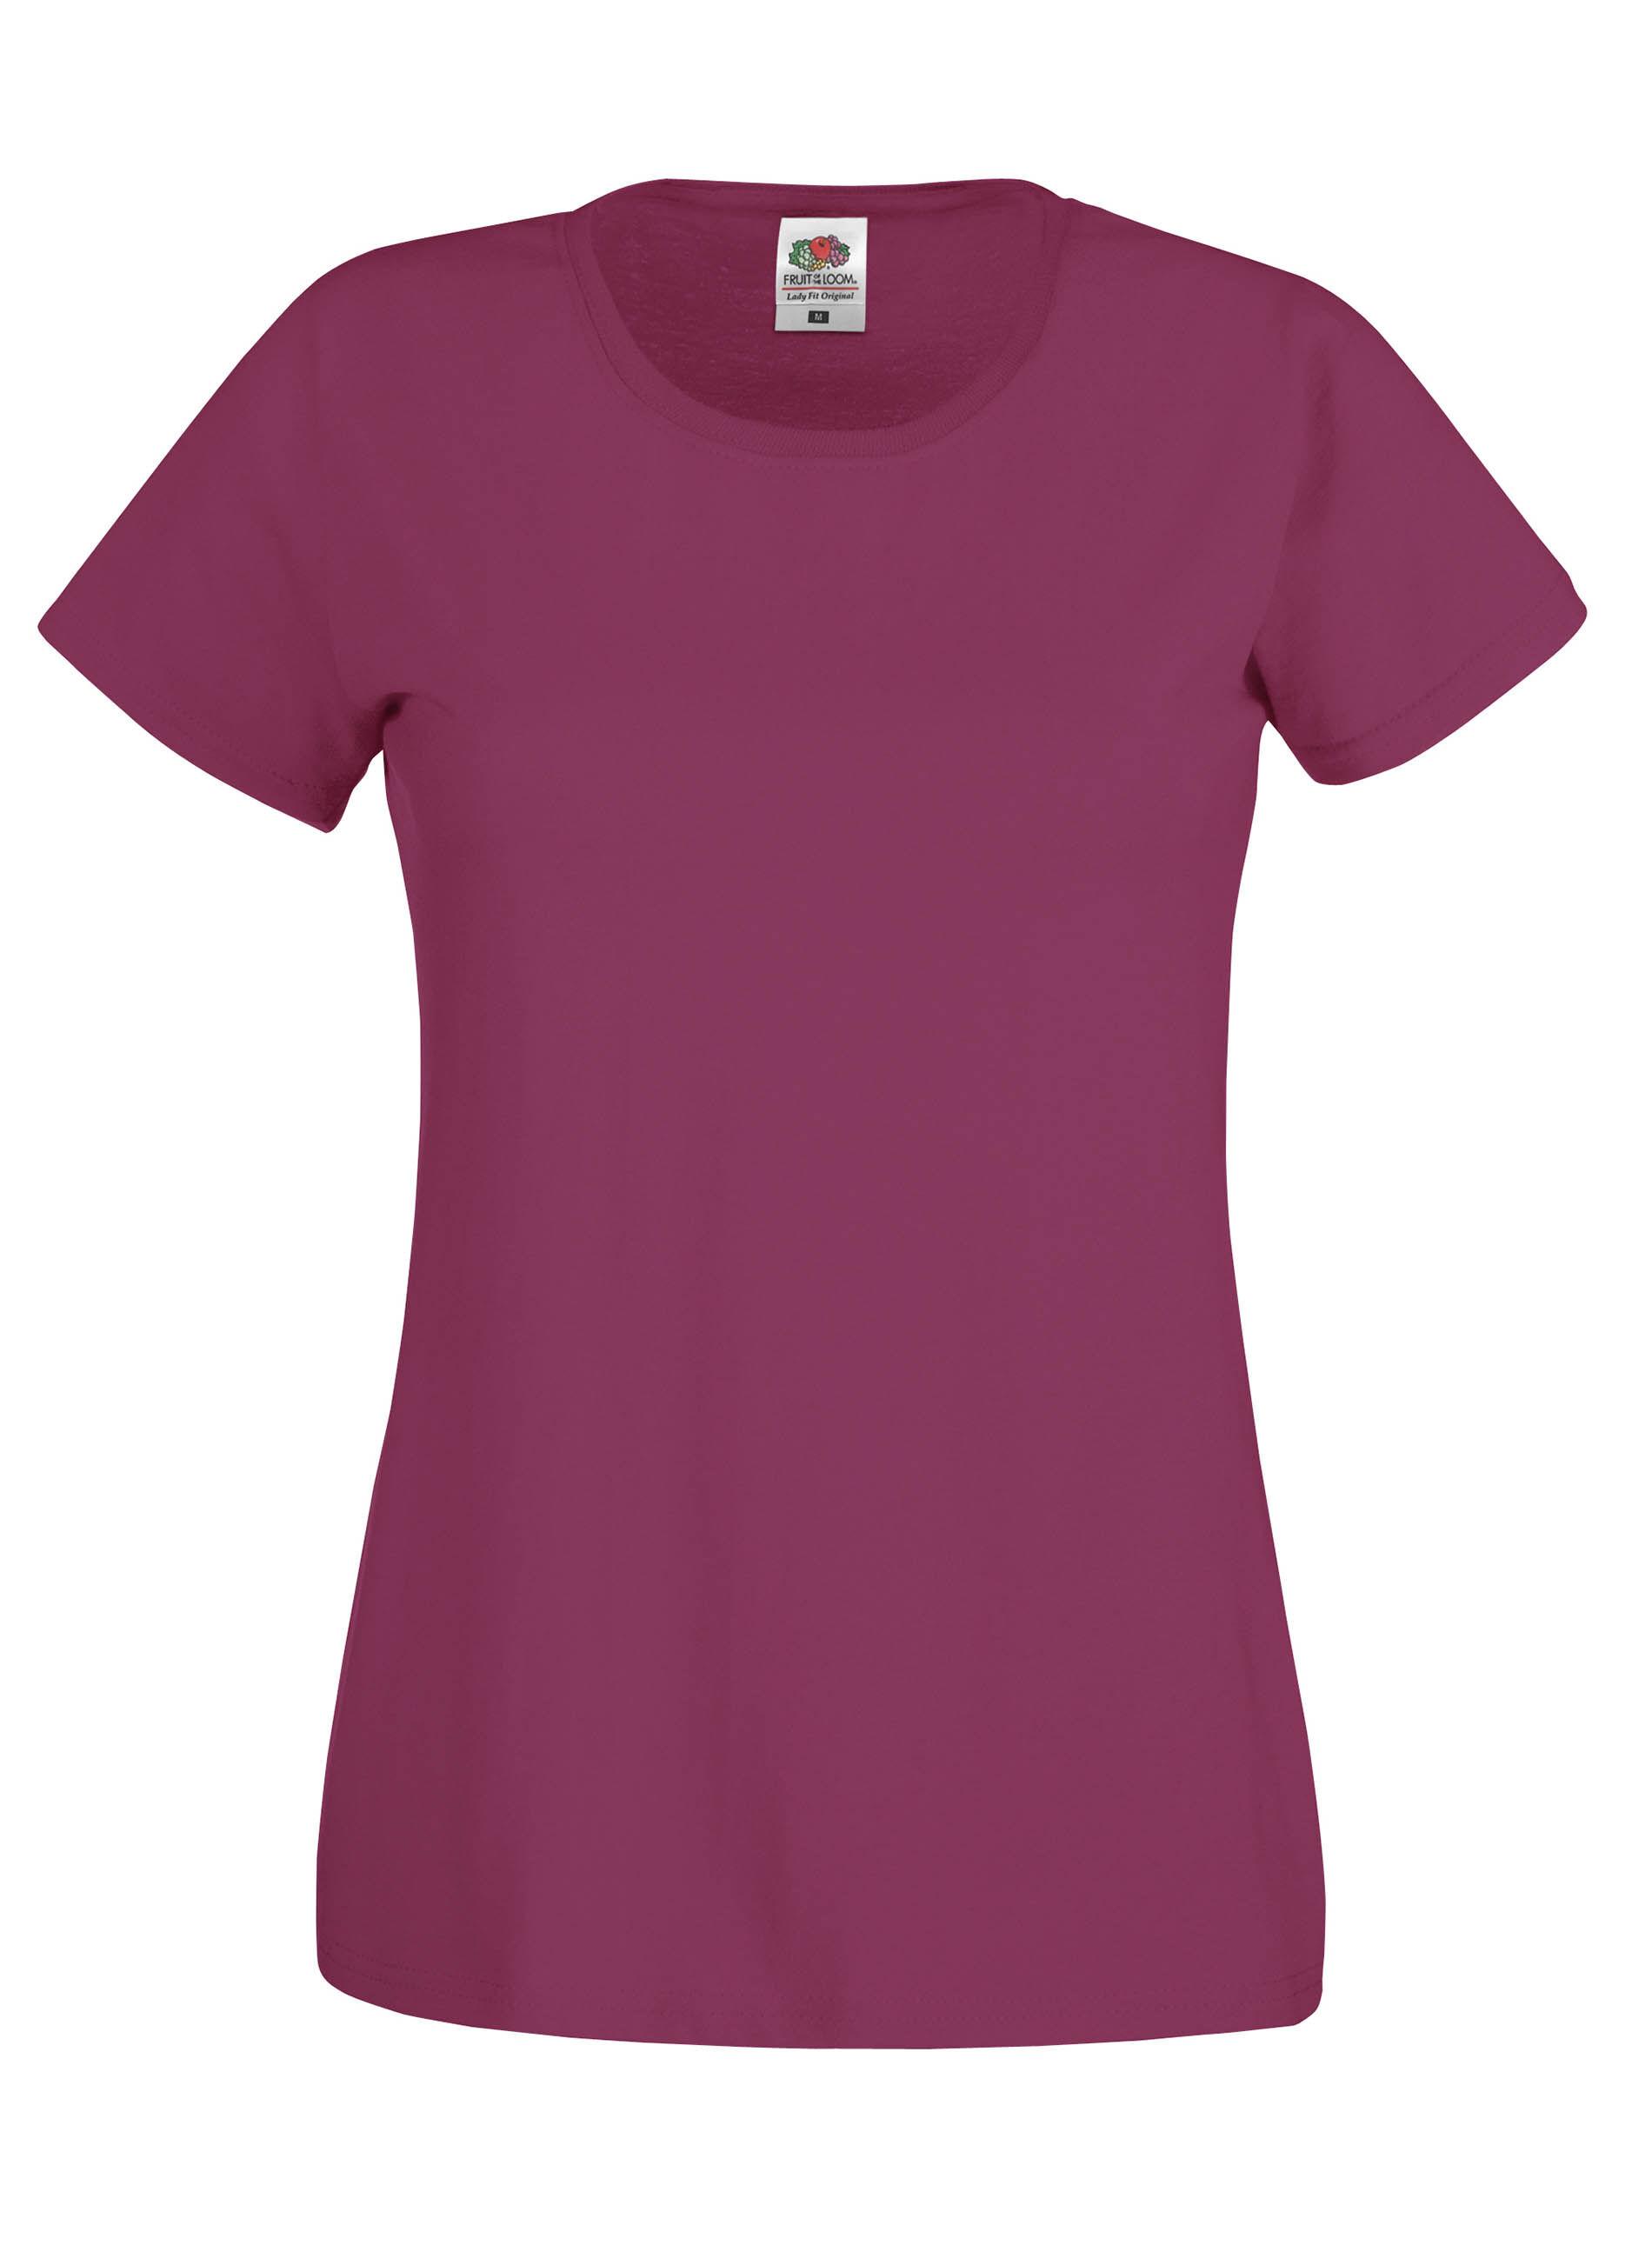 factory price cheapest official T-shirt Femme Original-T (Full Cut 61-420-0) Burgundy